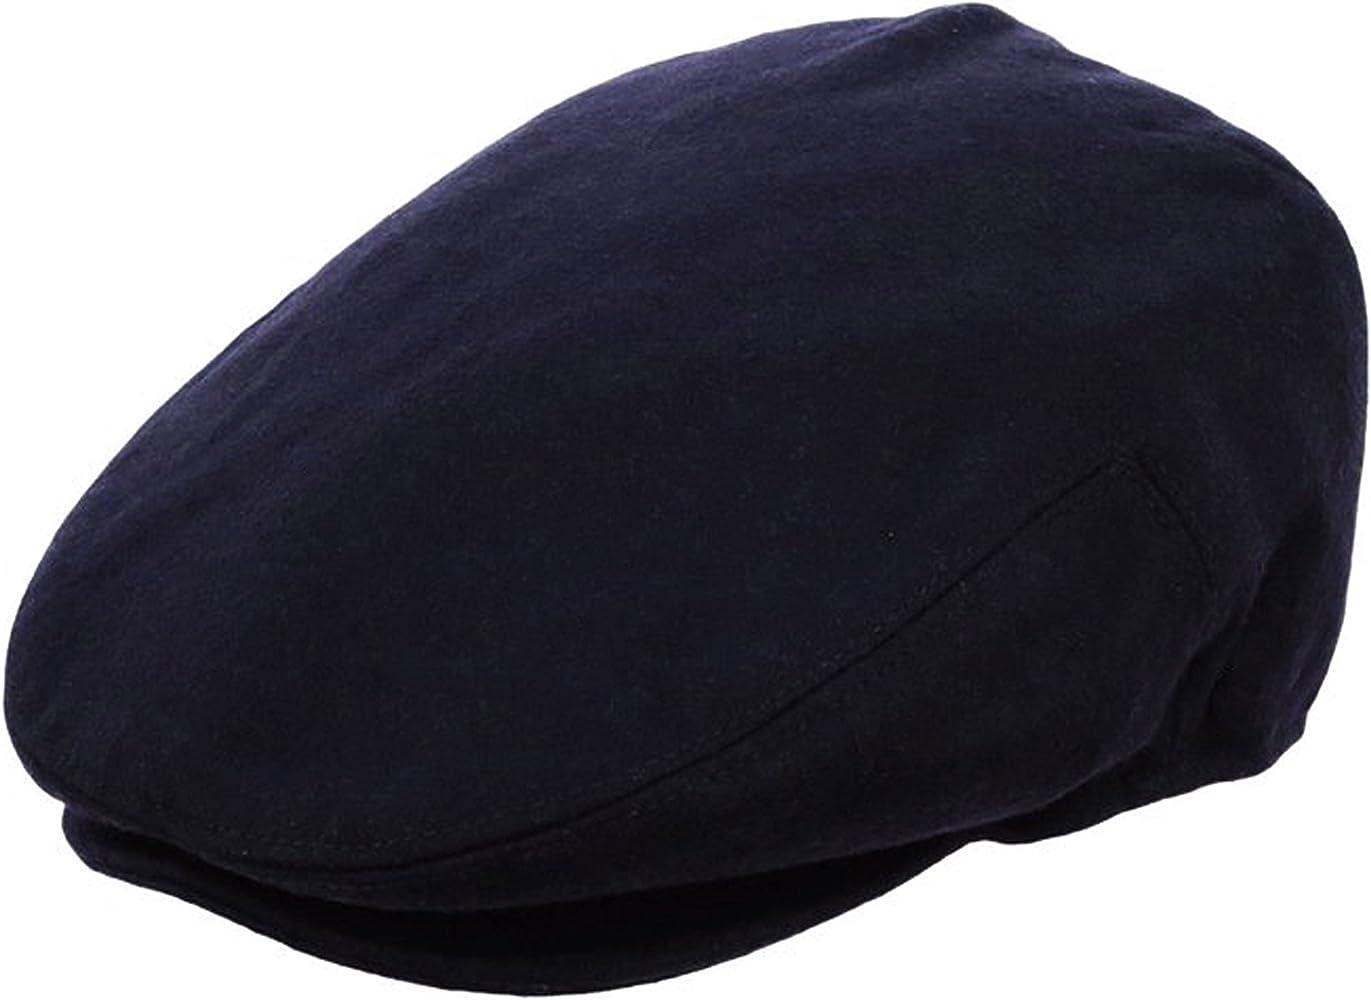 EPOCH Hats Mens Premium Wool Blend Classic Flat Ivy Newsboy Collection Hat